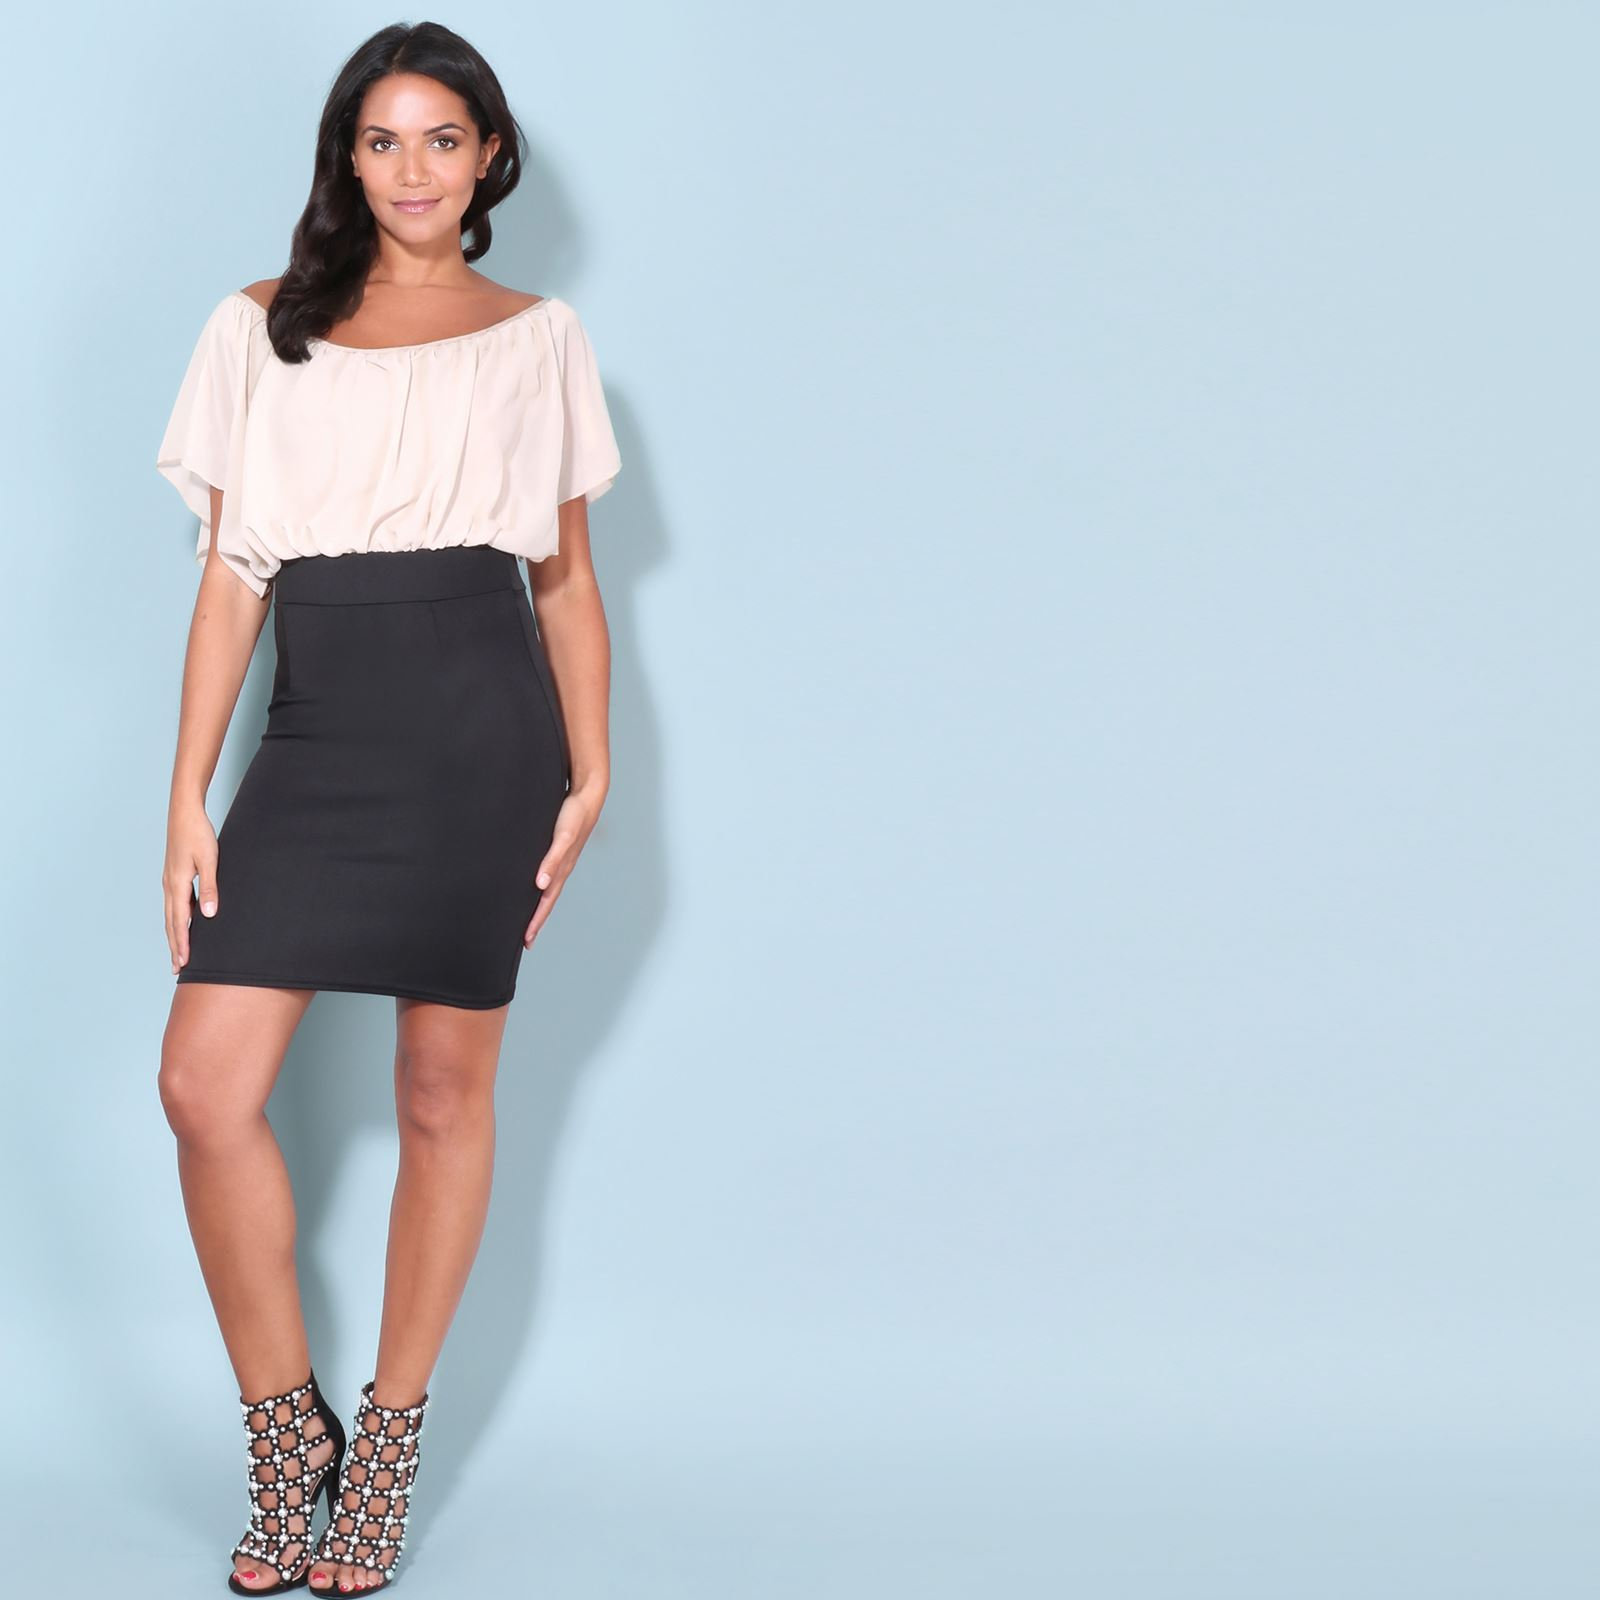 Womens-Pleated-Chiffon-Batwing-Top-High-Waist-Pencil-Bodycon-Skirt-Mini-Dress thumbnail 33